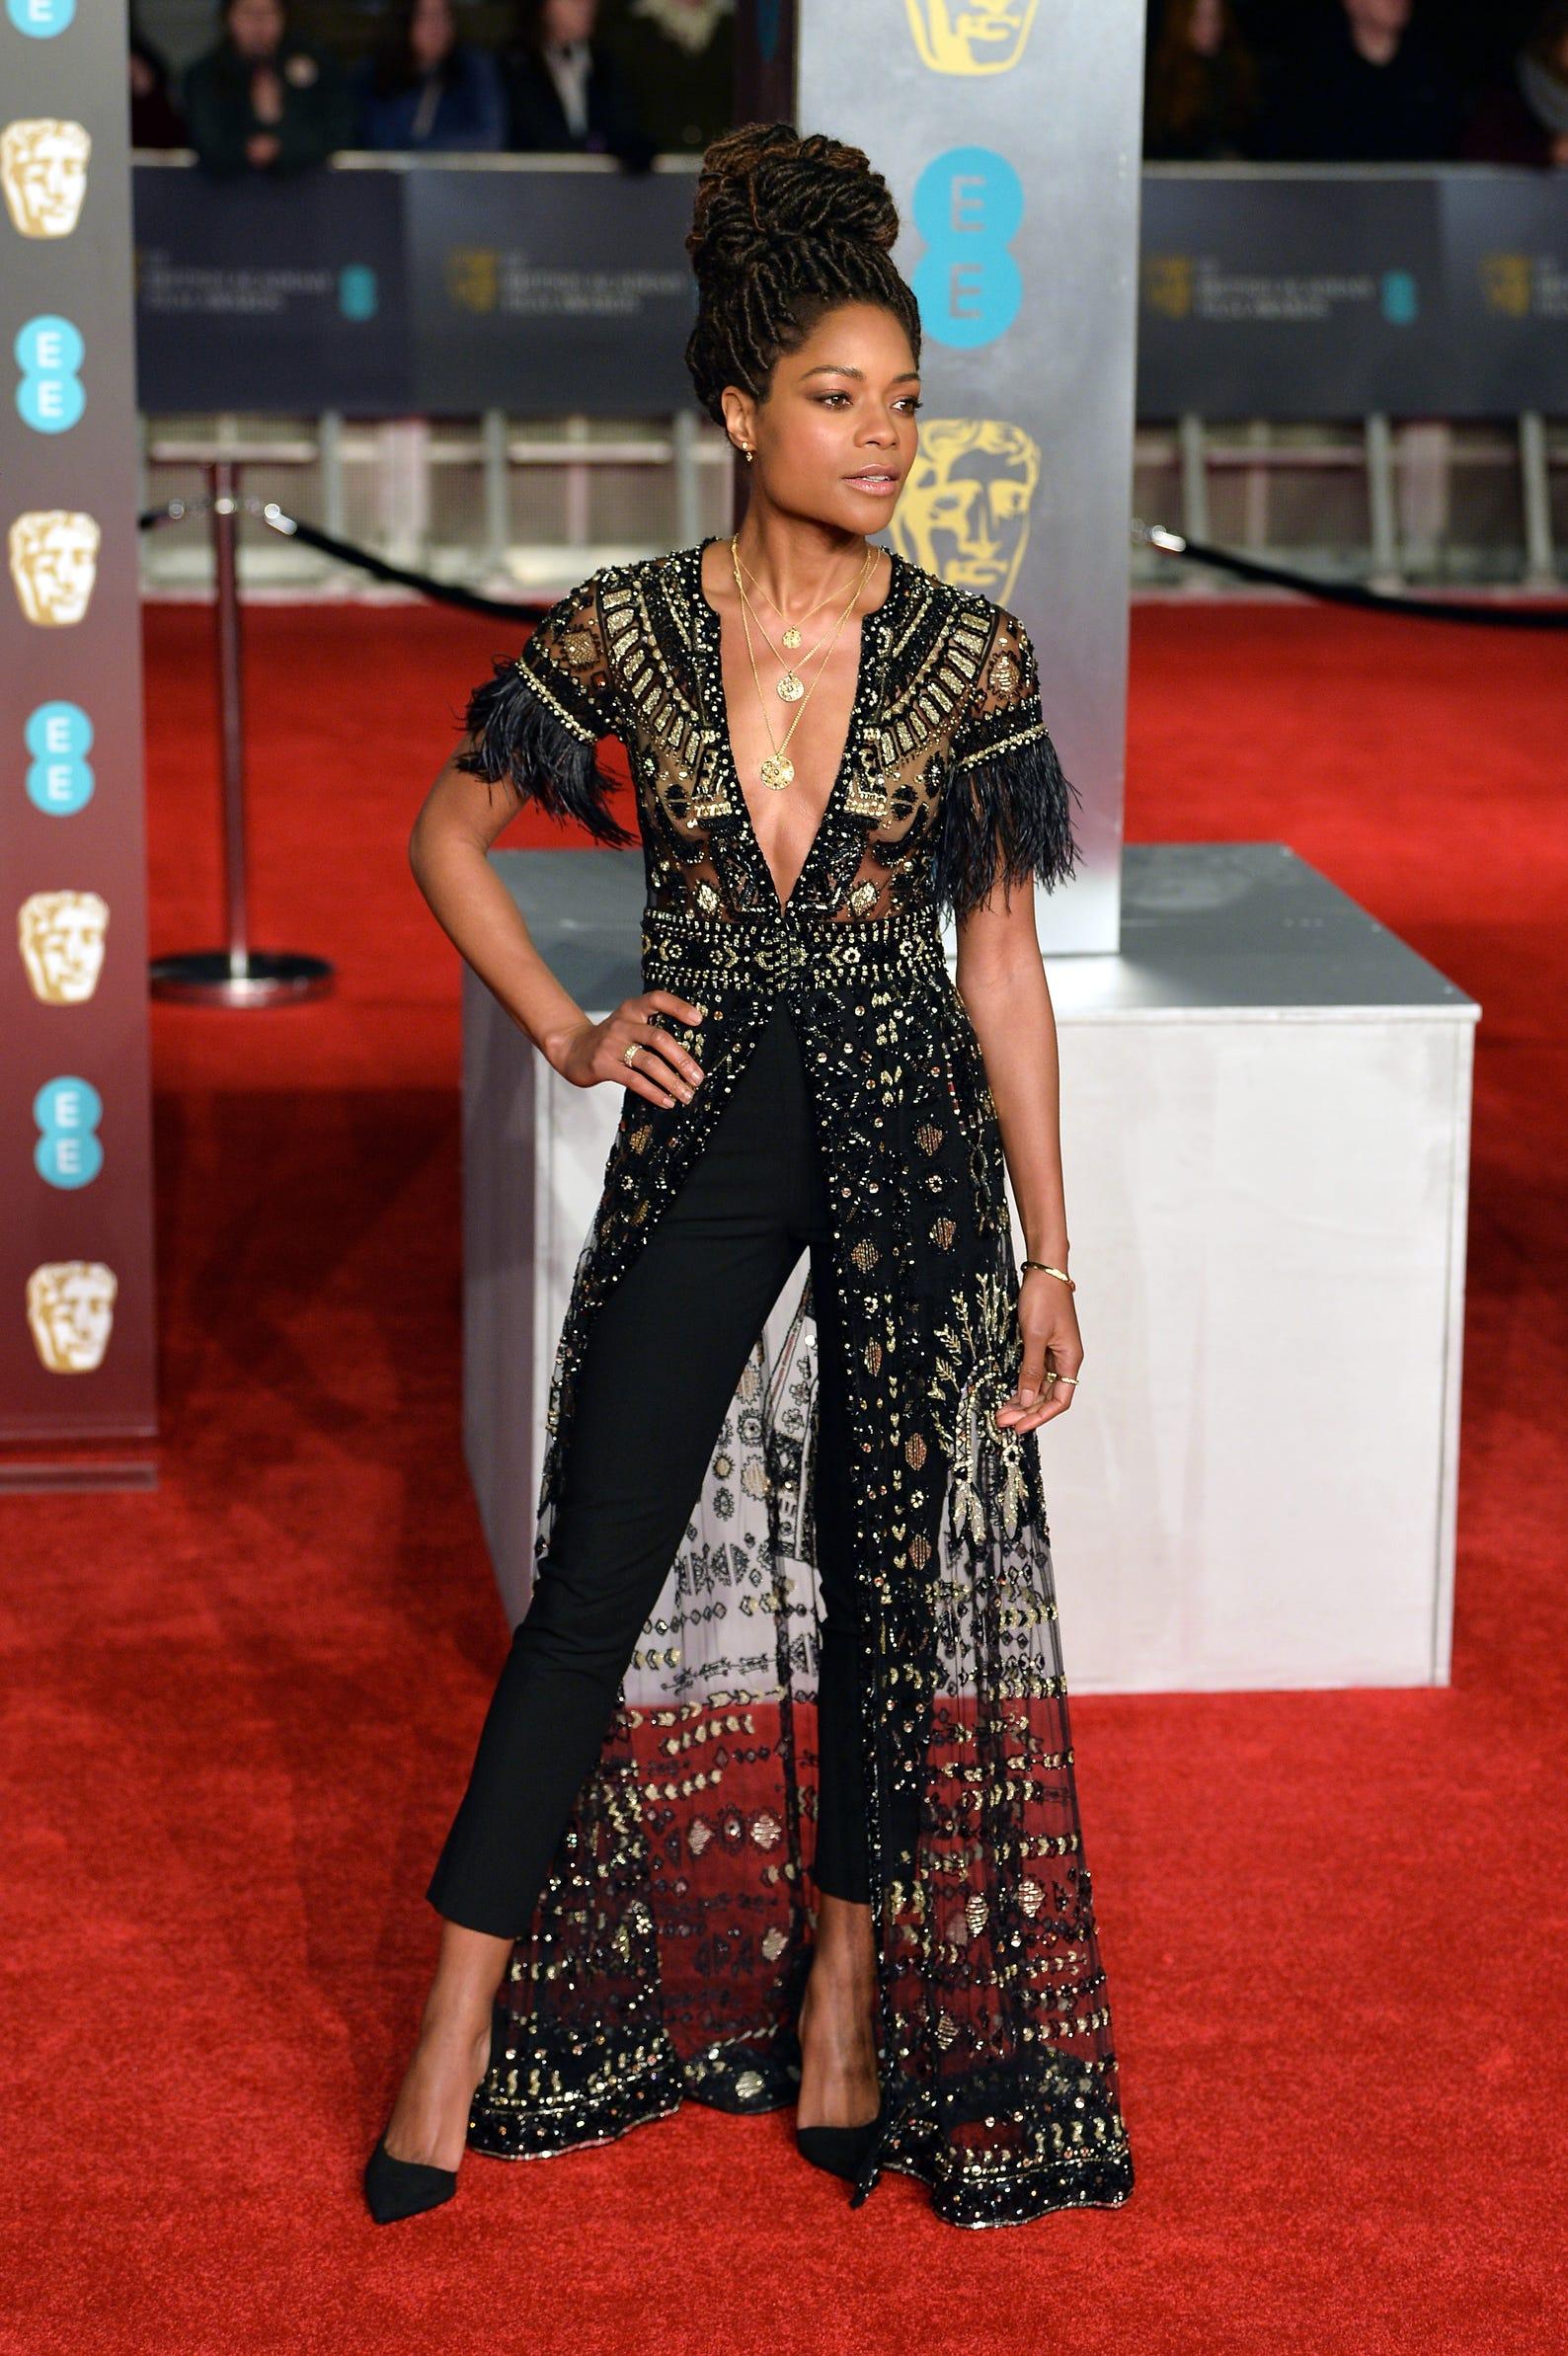 Allison Williams Thong red carpet secrets: sticky bras and waist cinchers